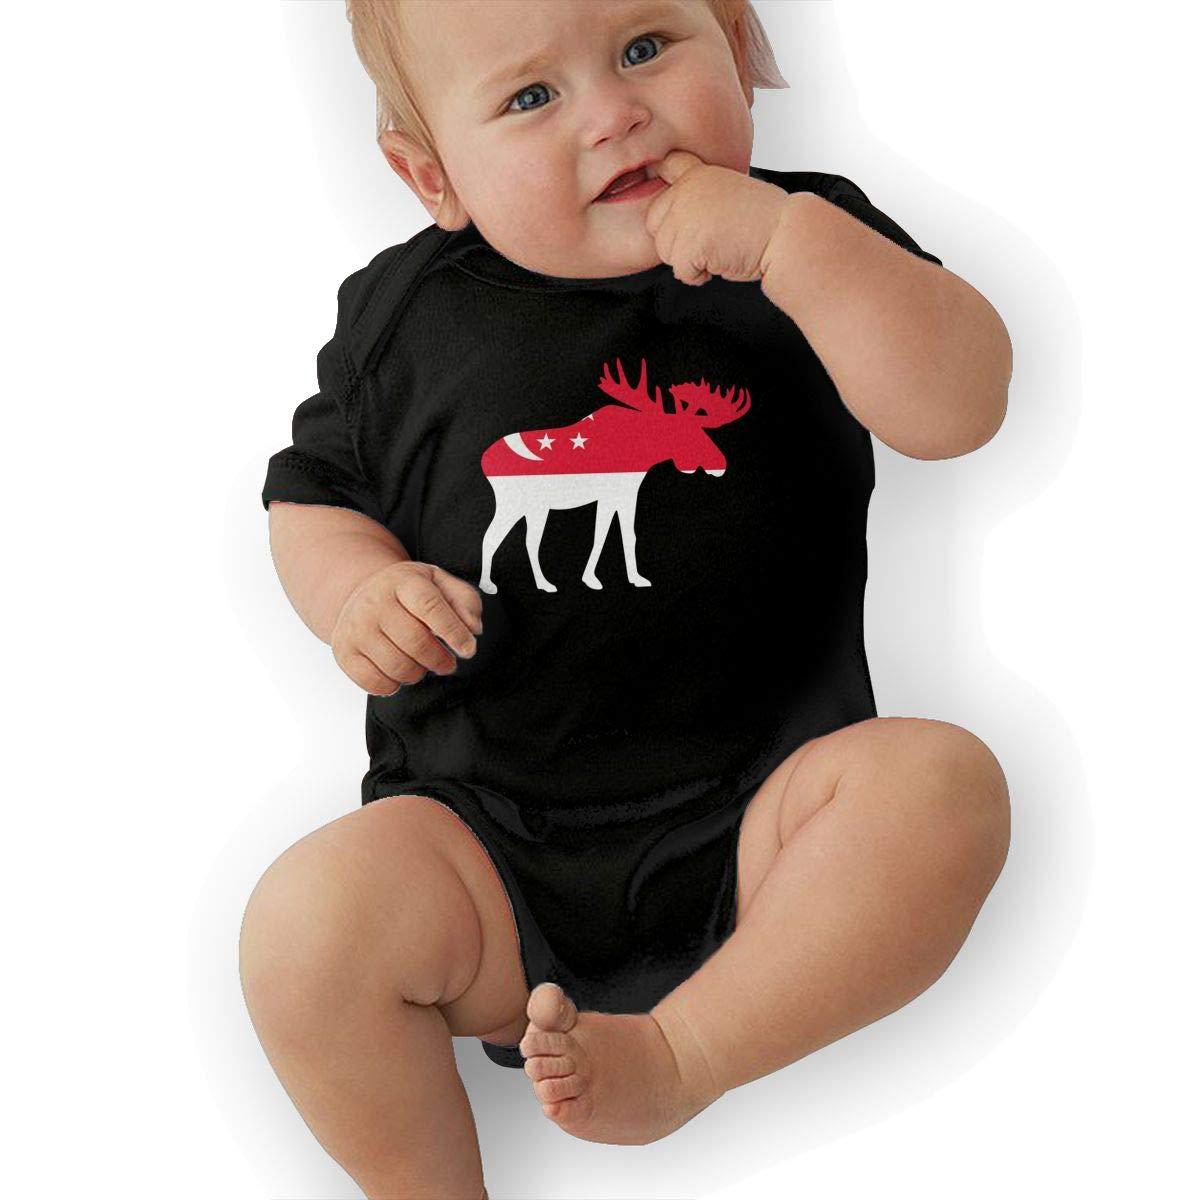 Soft Singapore Moose Crawler U88oi-8 Short Sleeve Cotton Bodysuit for Baby Girls Boys